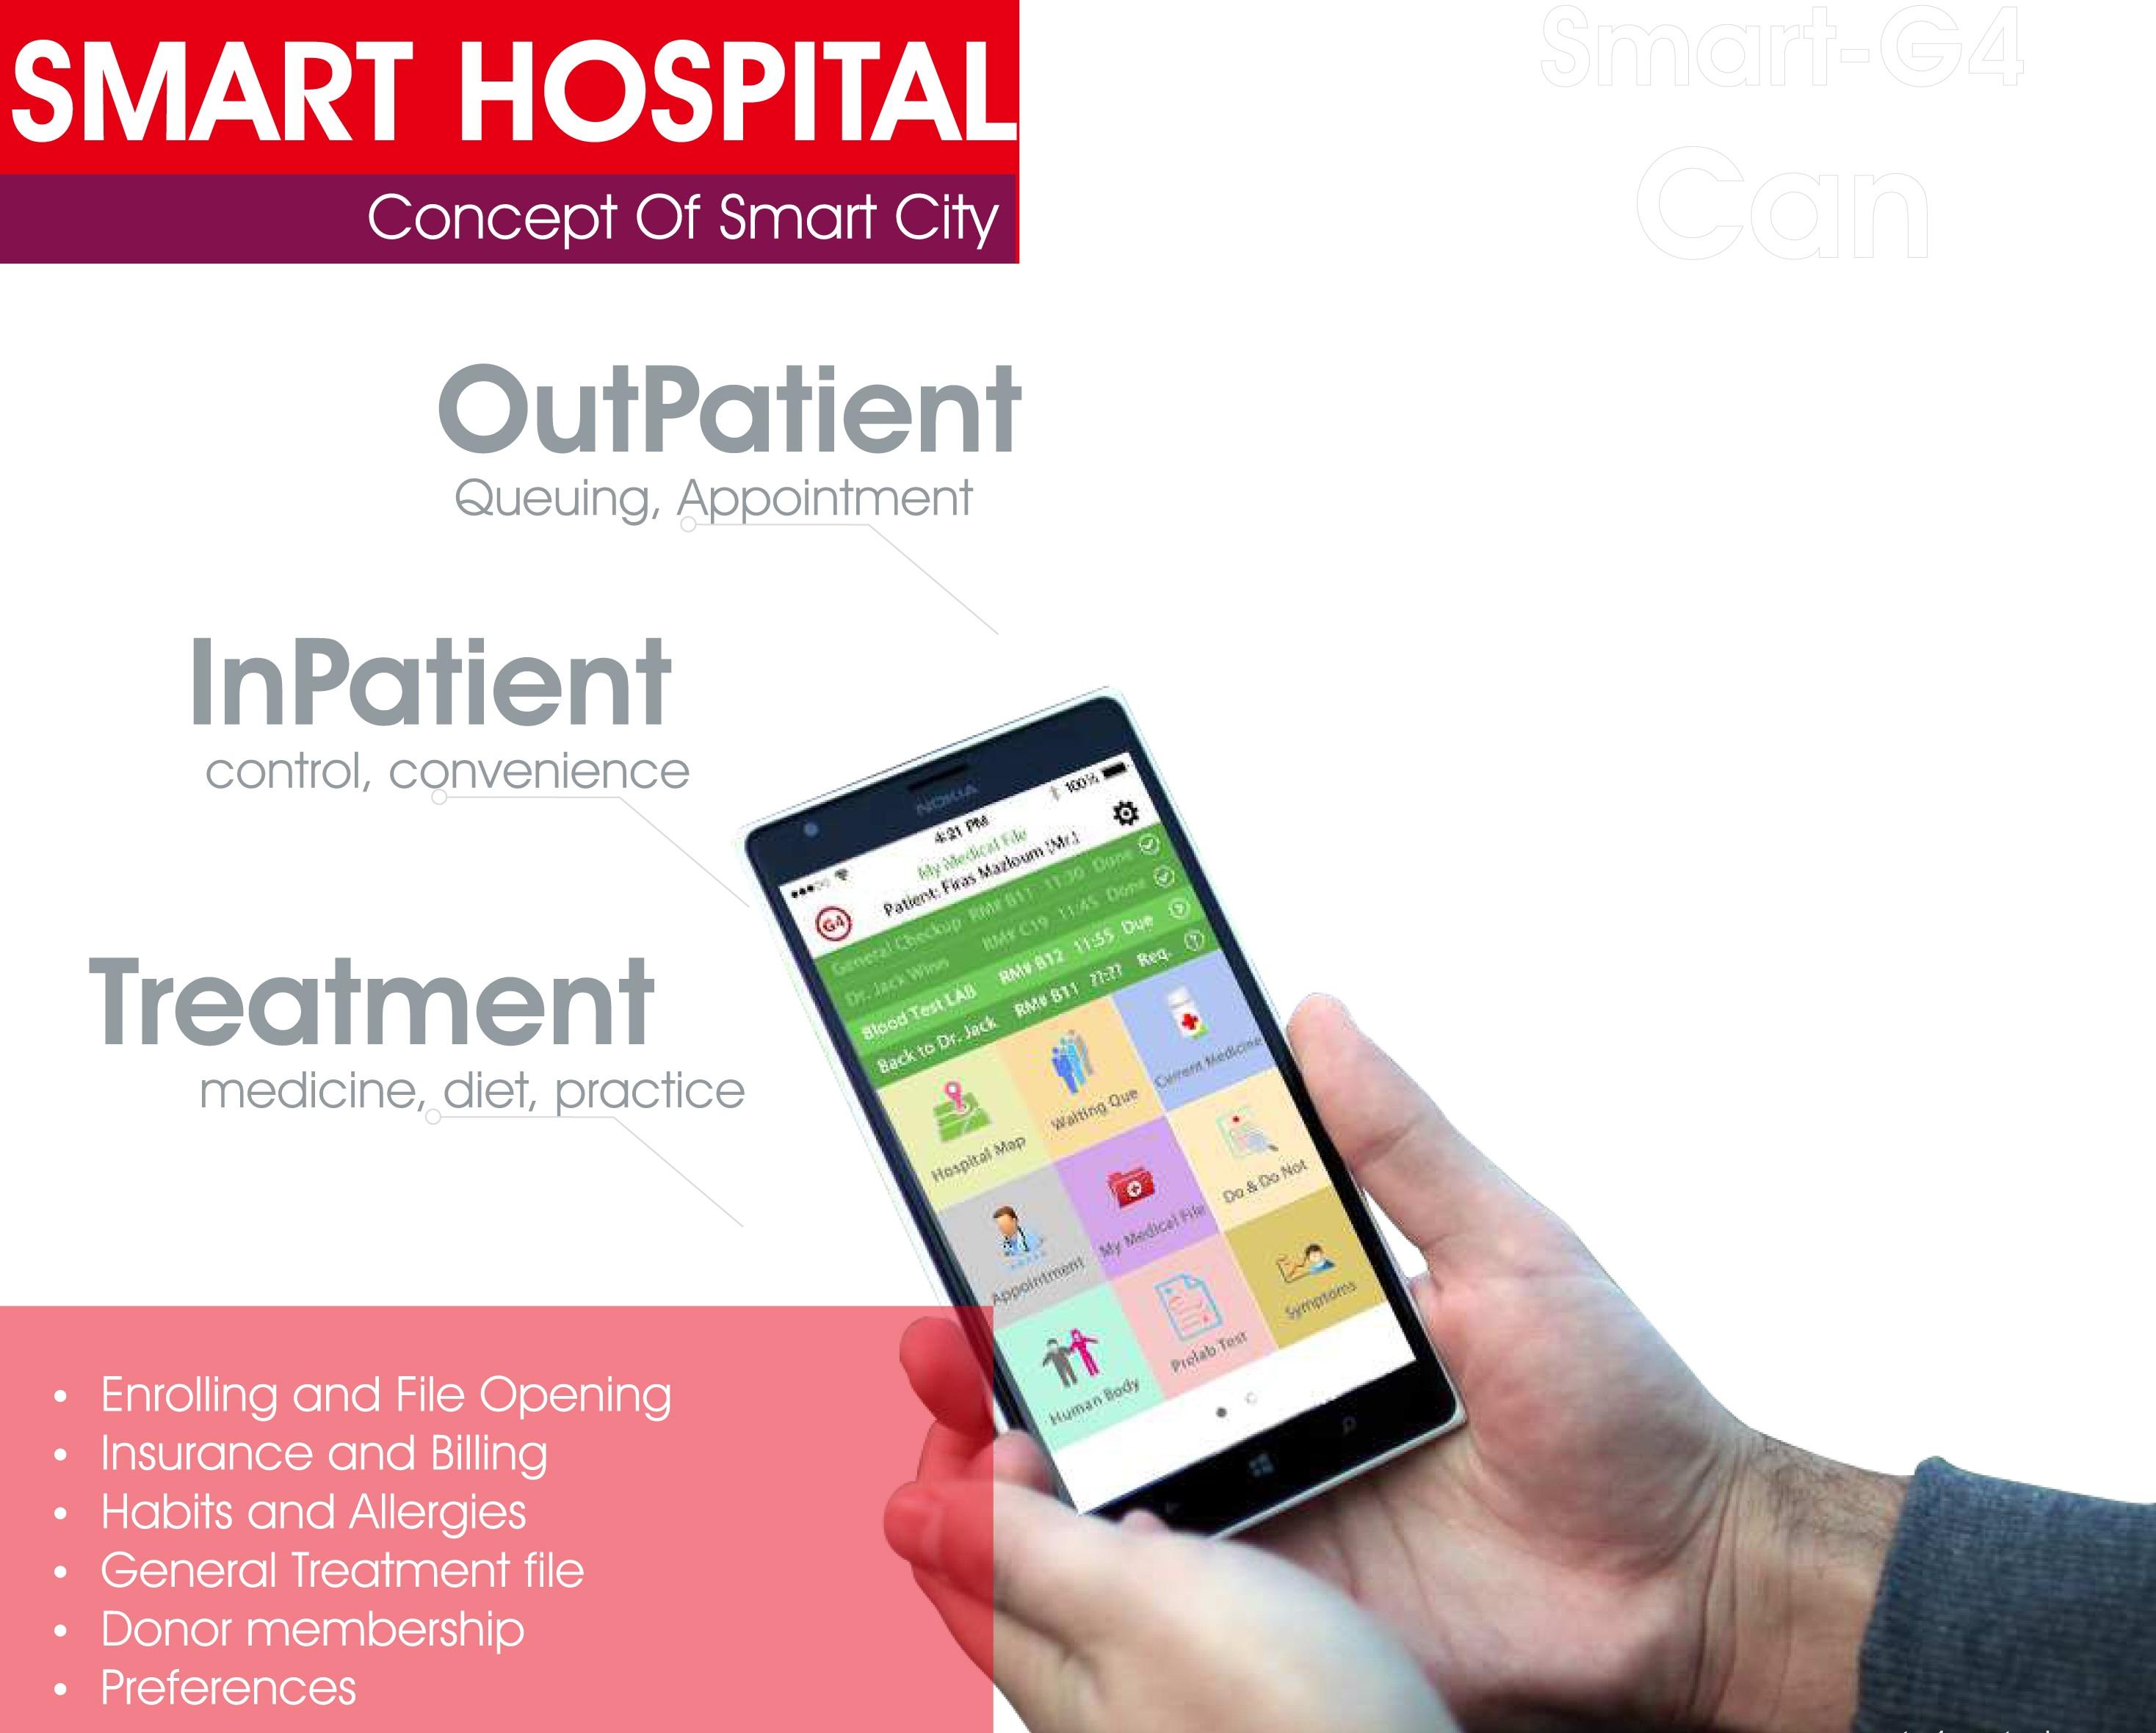 SmartHospital